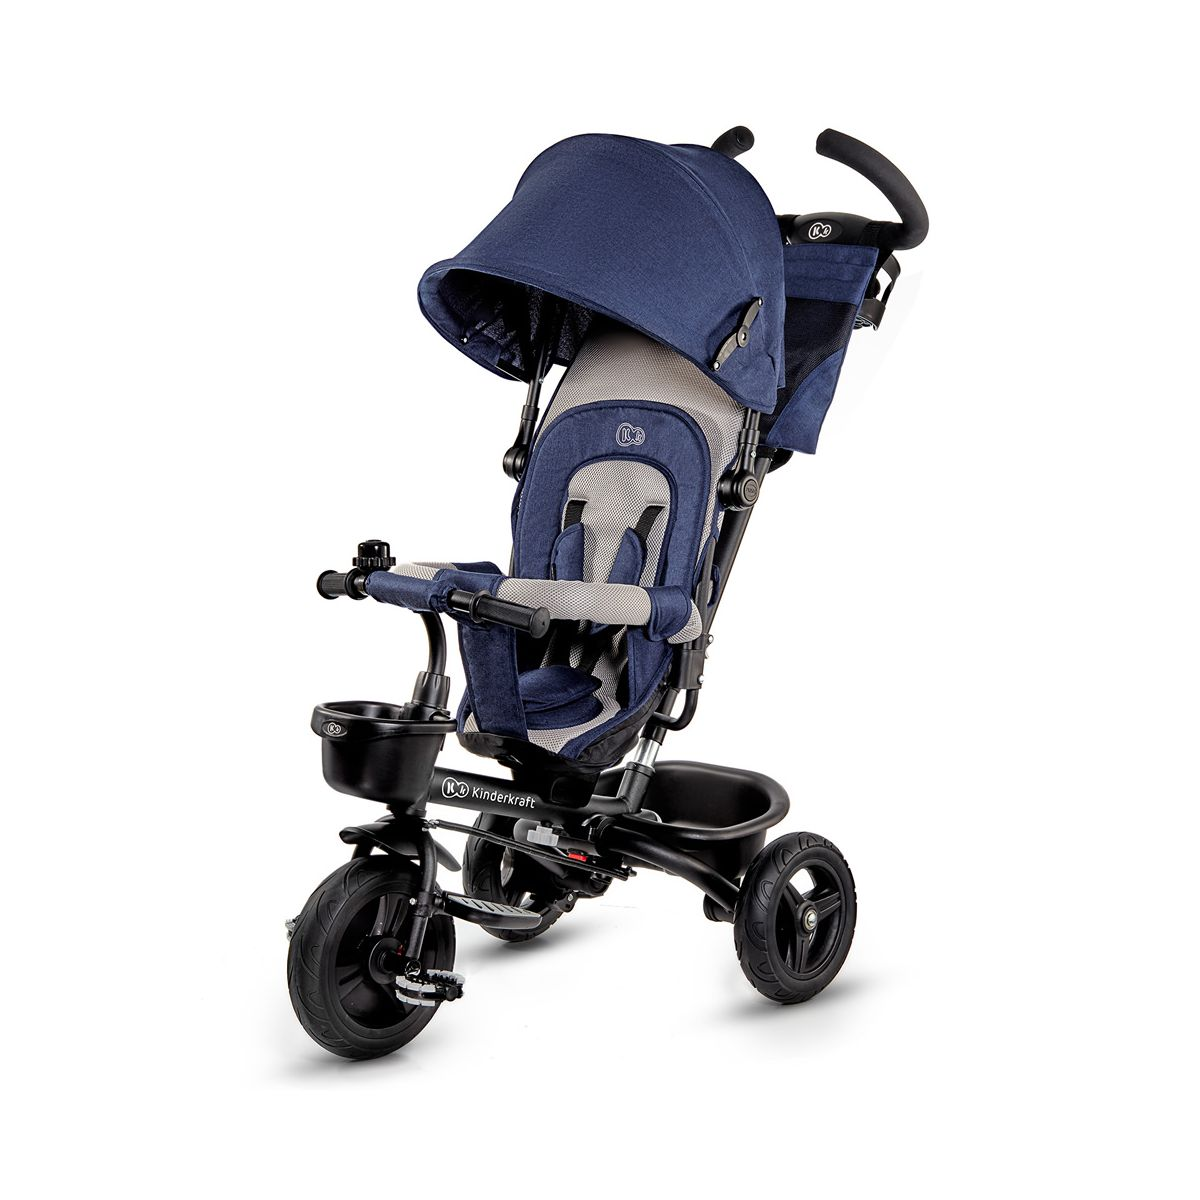 Kinderkraft Aveo Tricycle-Navy (Exclusive to Kiddies Kingdom)